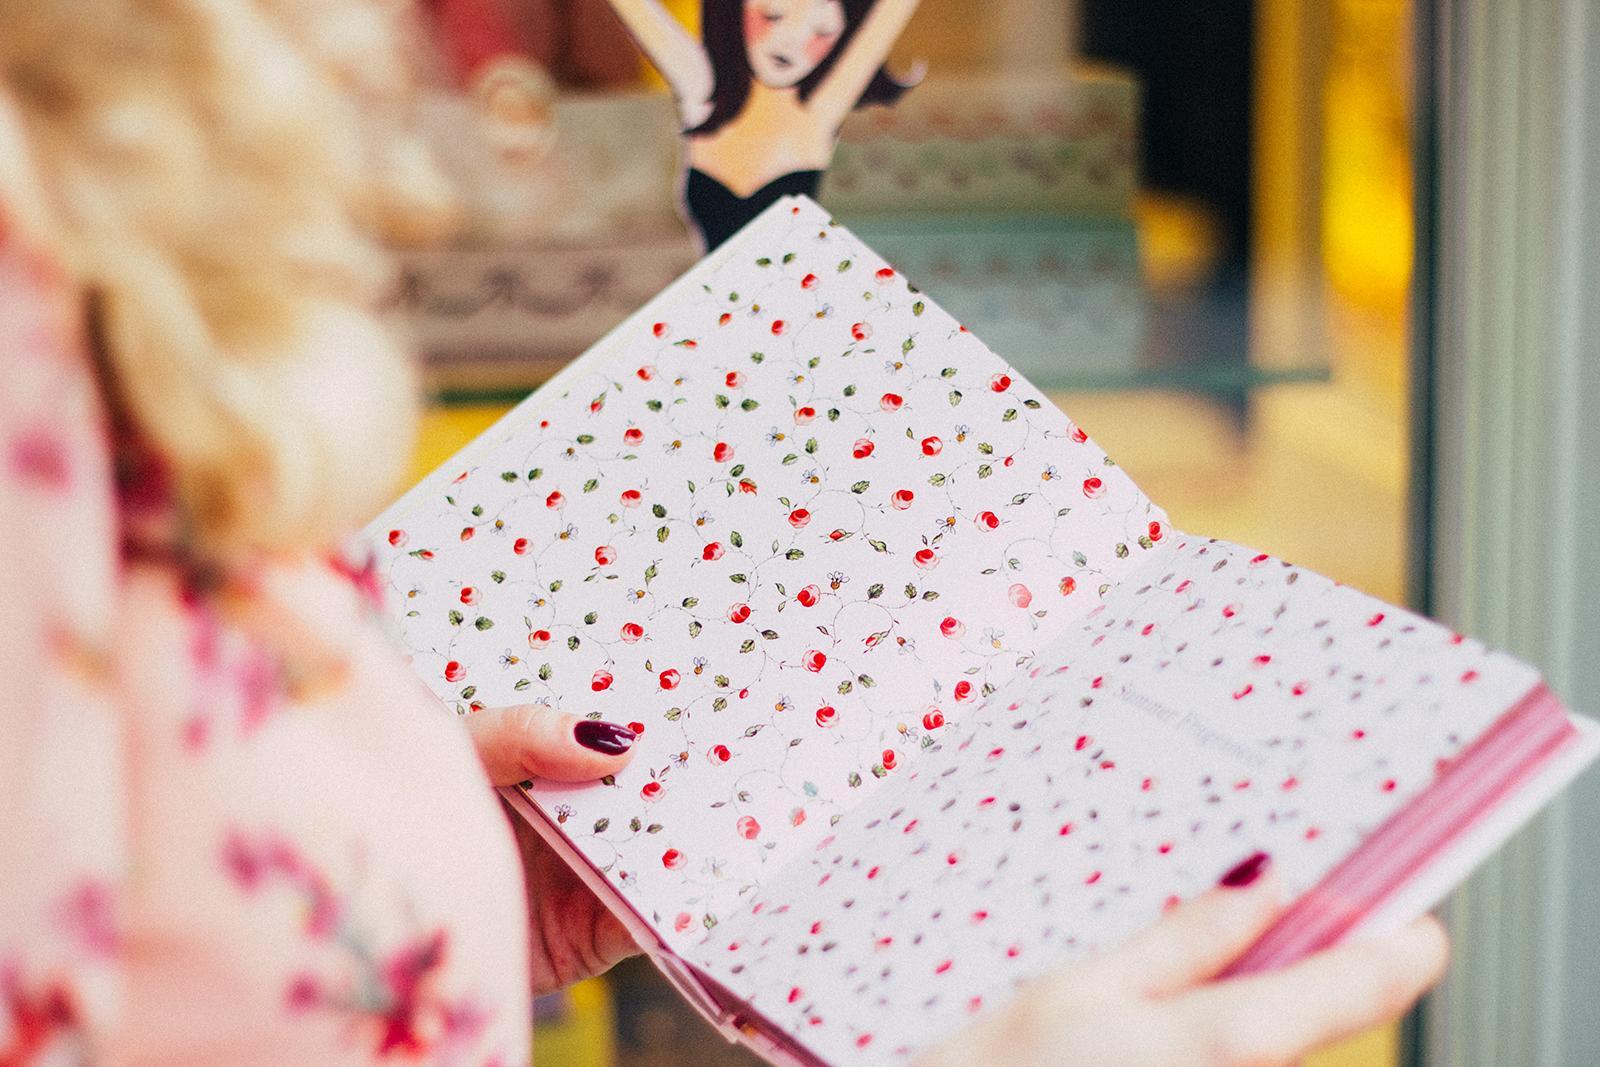 margarita_maslova_pink_floral_dress_laduree_moscow_marsala_heels